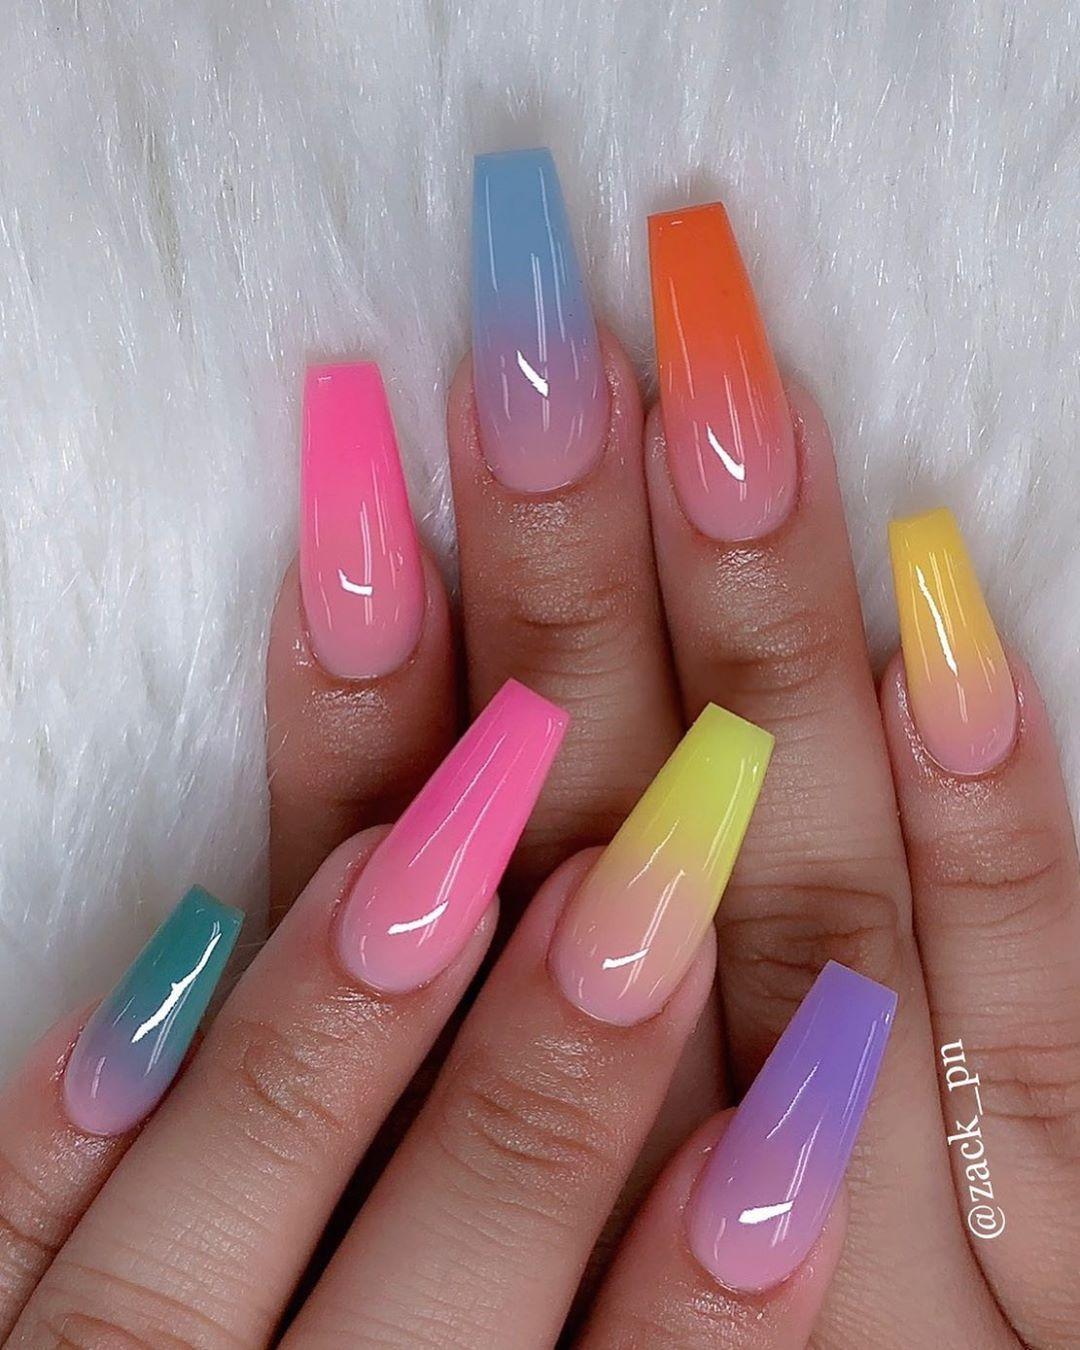 Zack Pn On Instagram Summer Rainbow Look Cute Nailpro